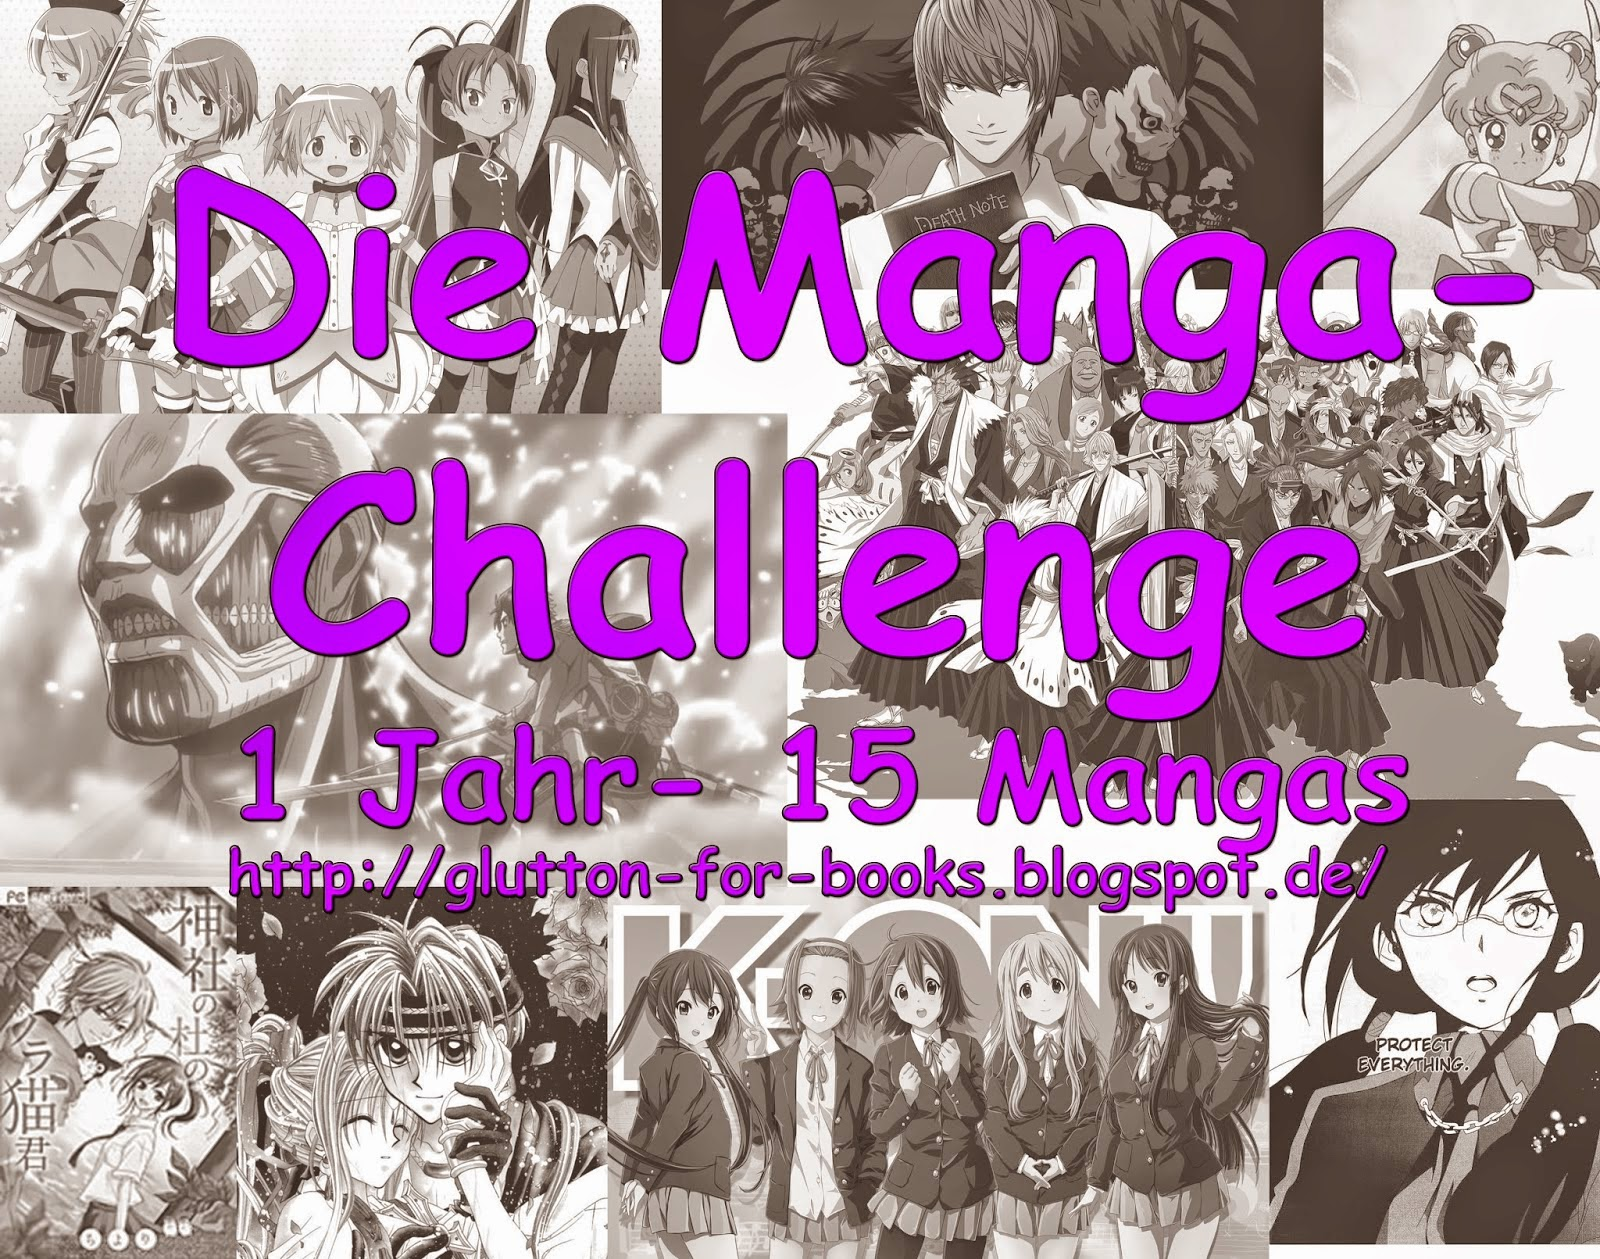 http://glutton-for-books.blogspot.de/2014/08/manga-challenge-1-jahr-15-mangas-seid.html